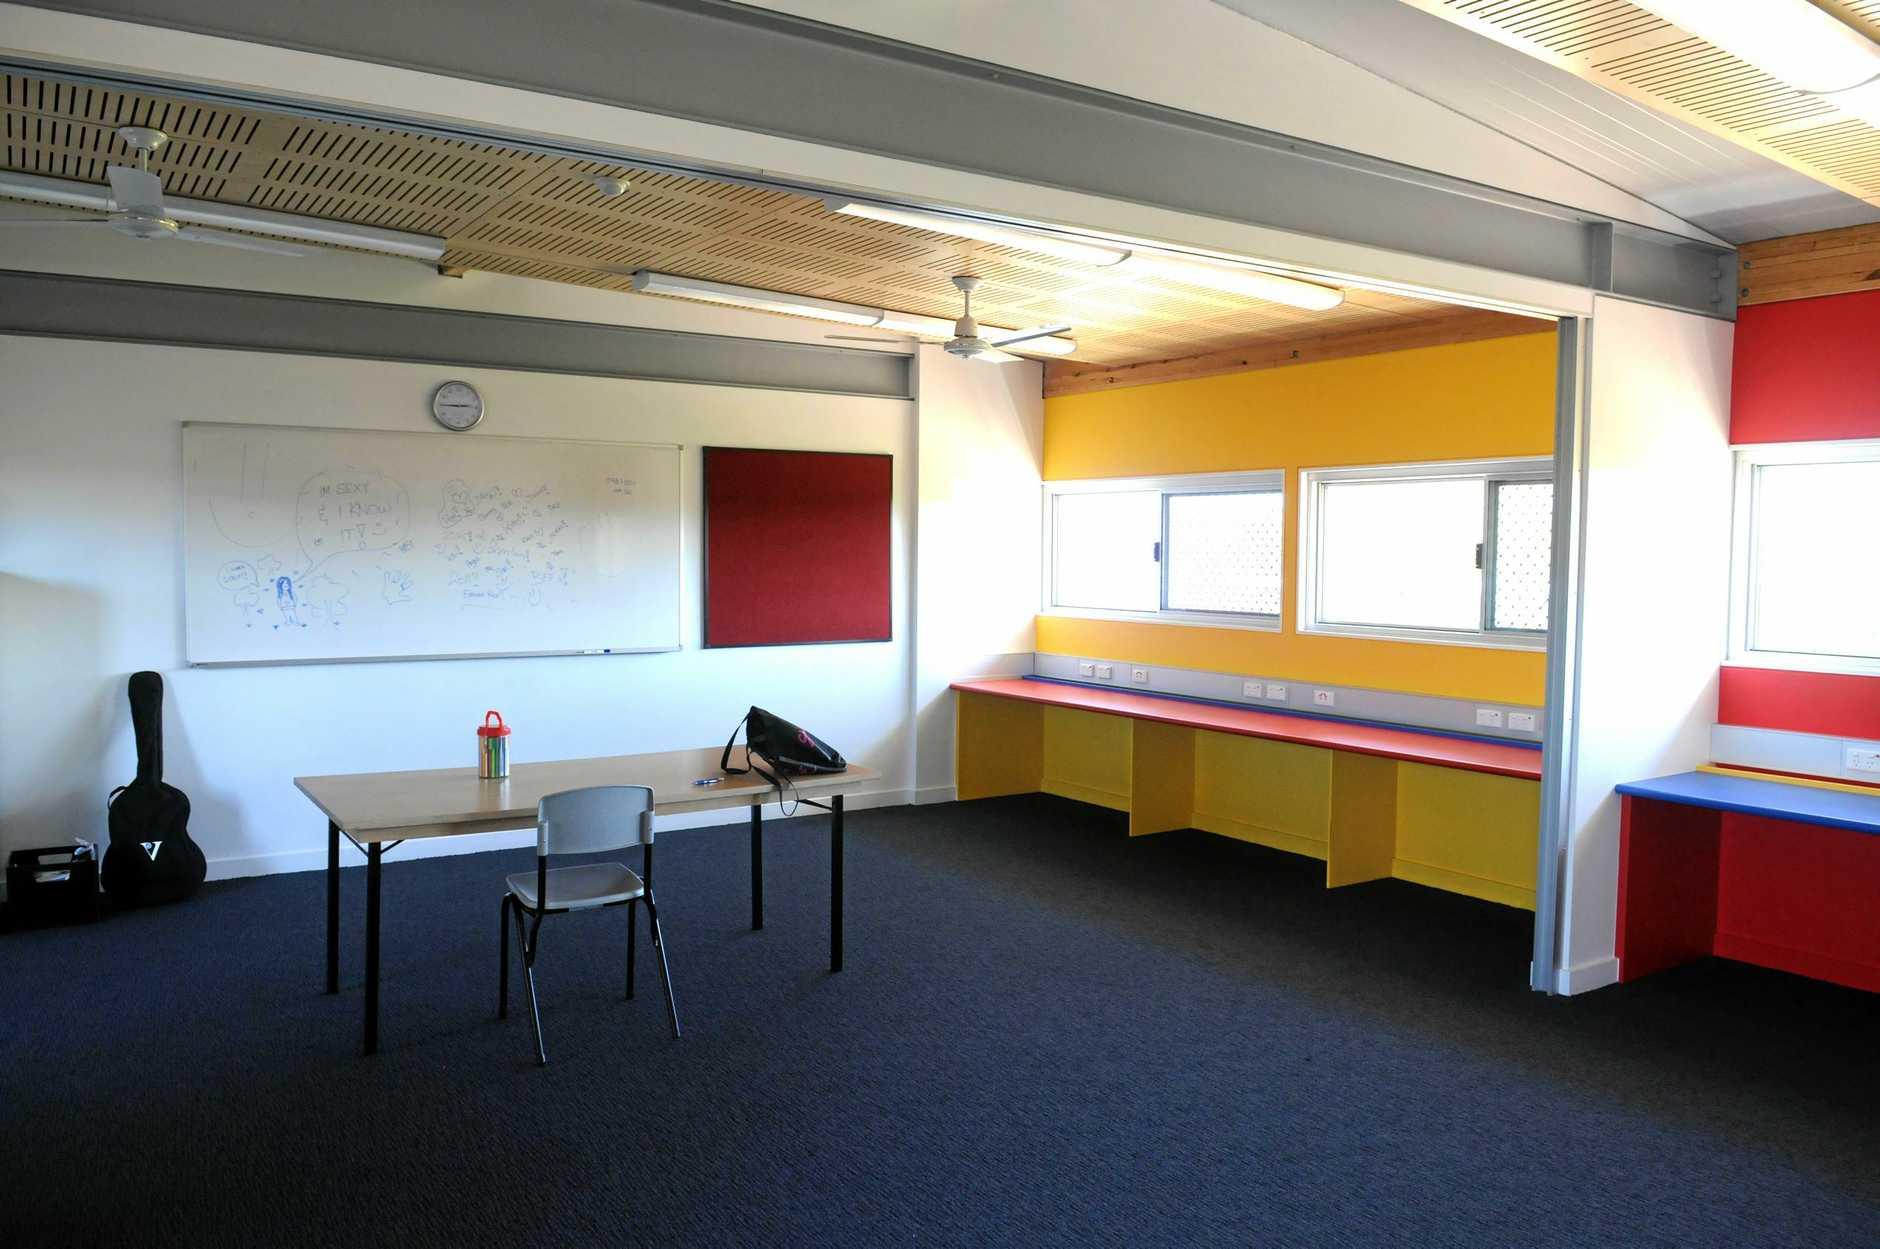 Classroom Edmund Rice School in Gympie with teacher Jasmin Crouch Photo Craig Warhurst / The Gympie Times